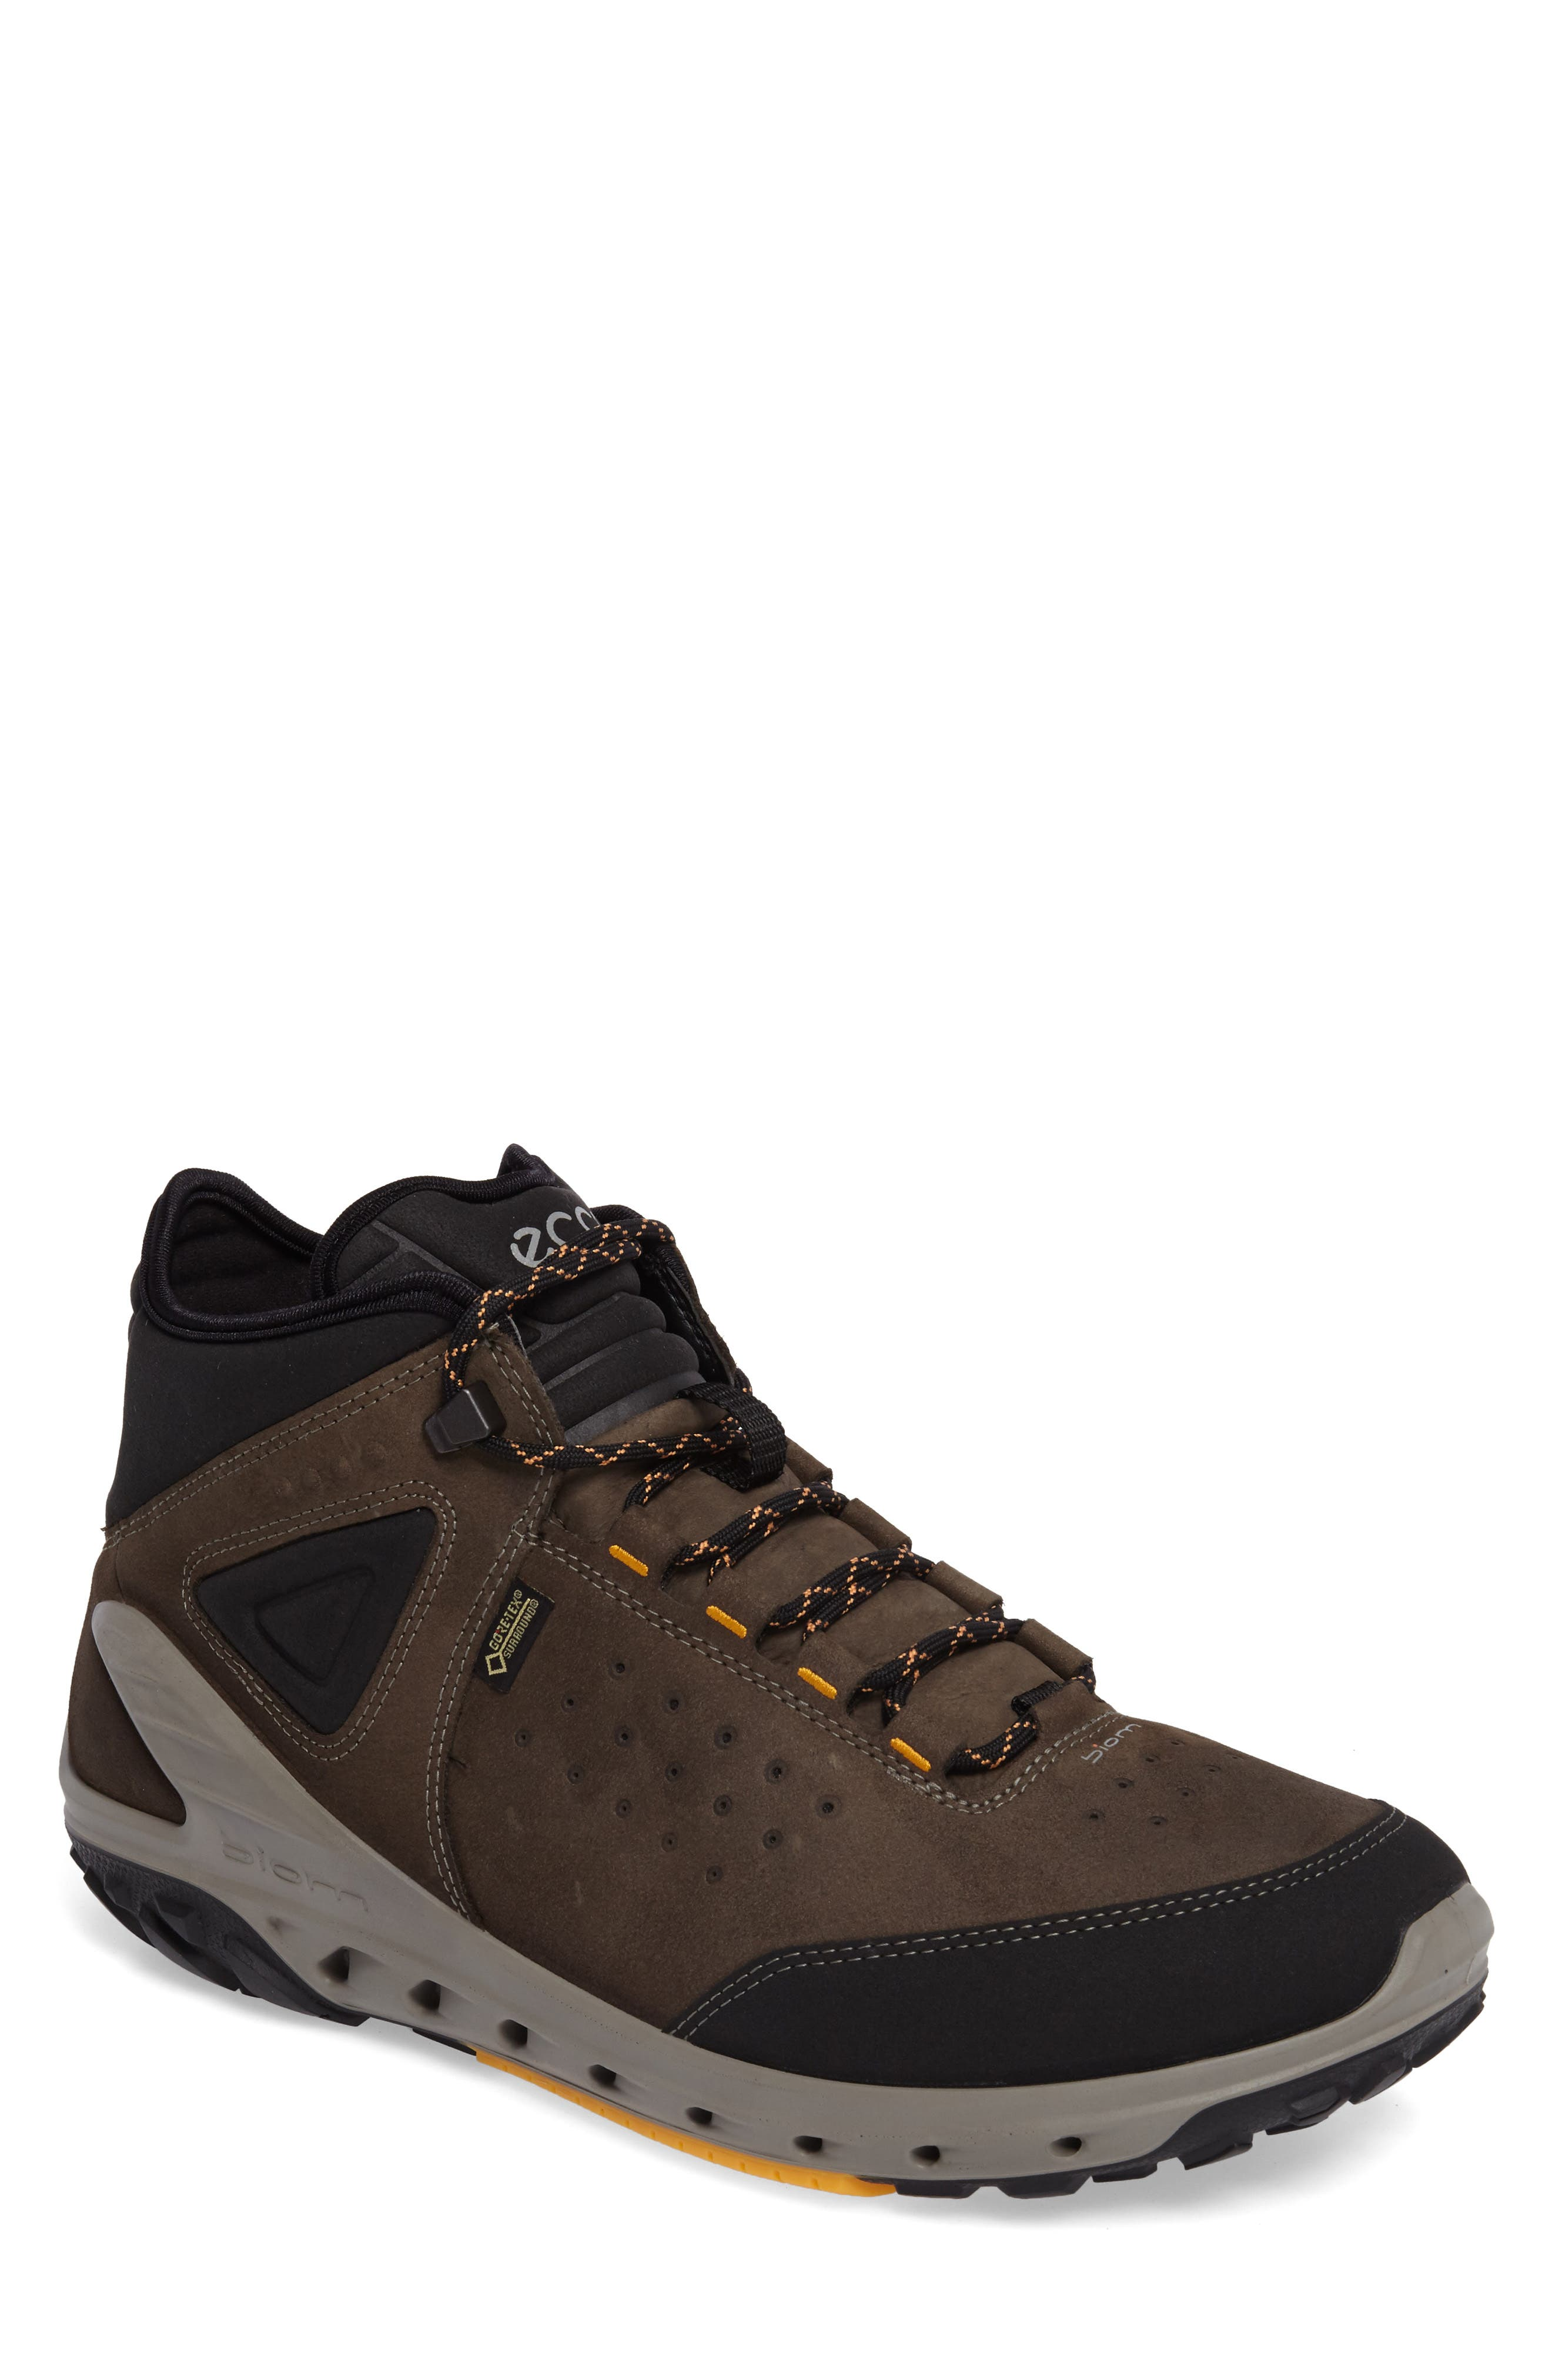 ECCO Biom GTX Venture Boot (Men)